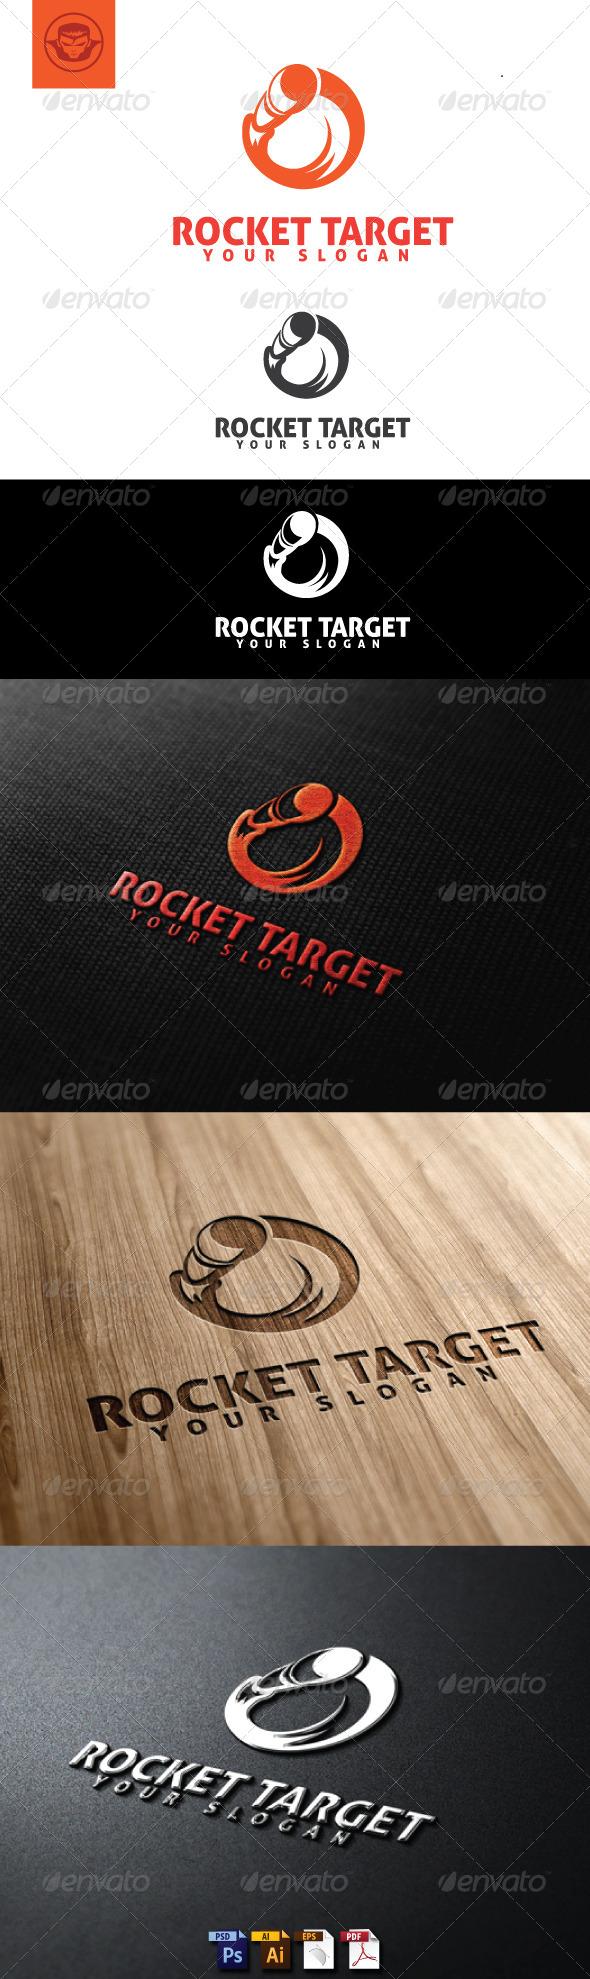 Rocket Target Logo Template - Objects Logo Templates